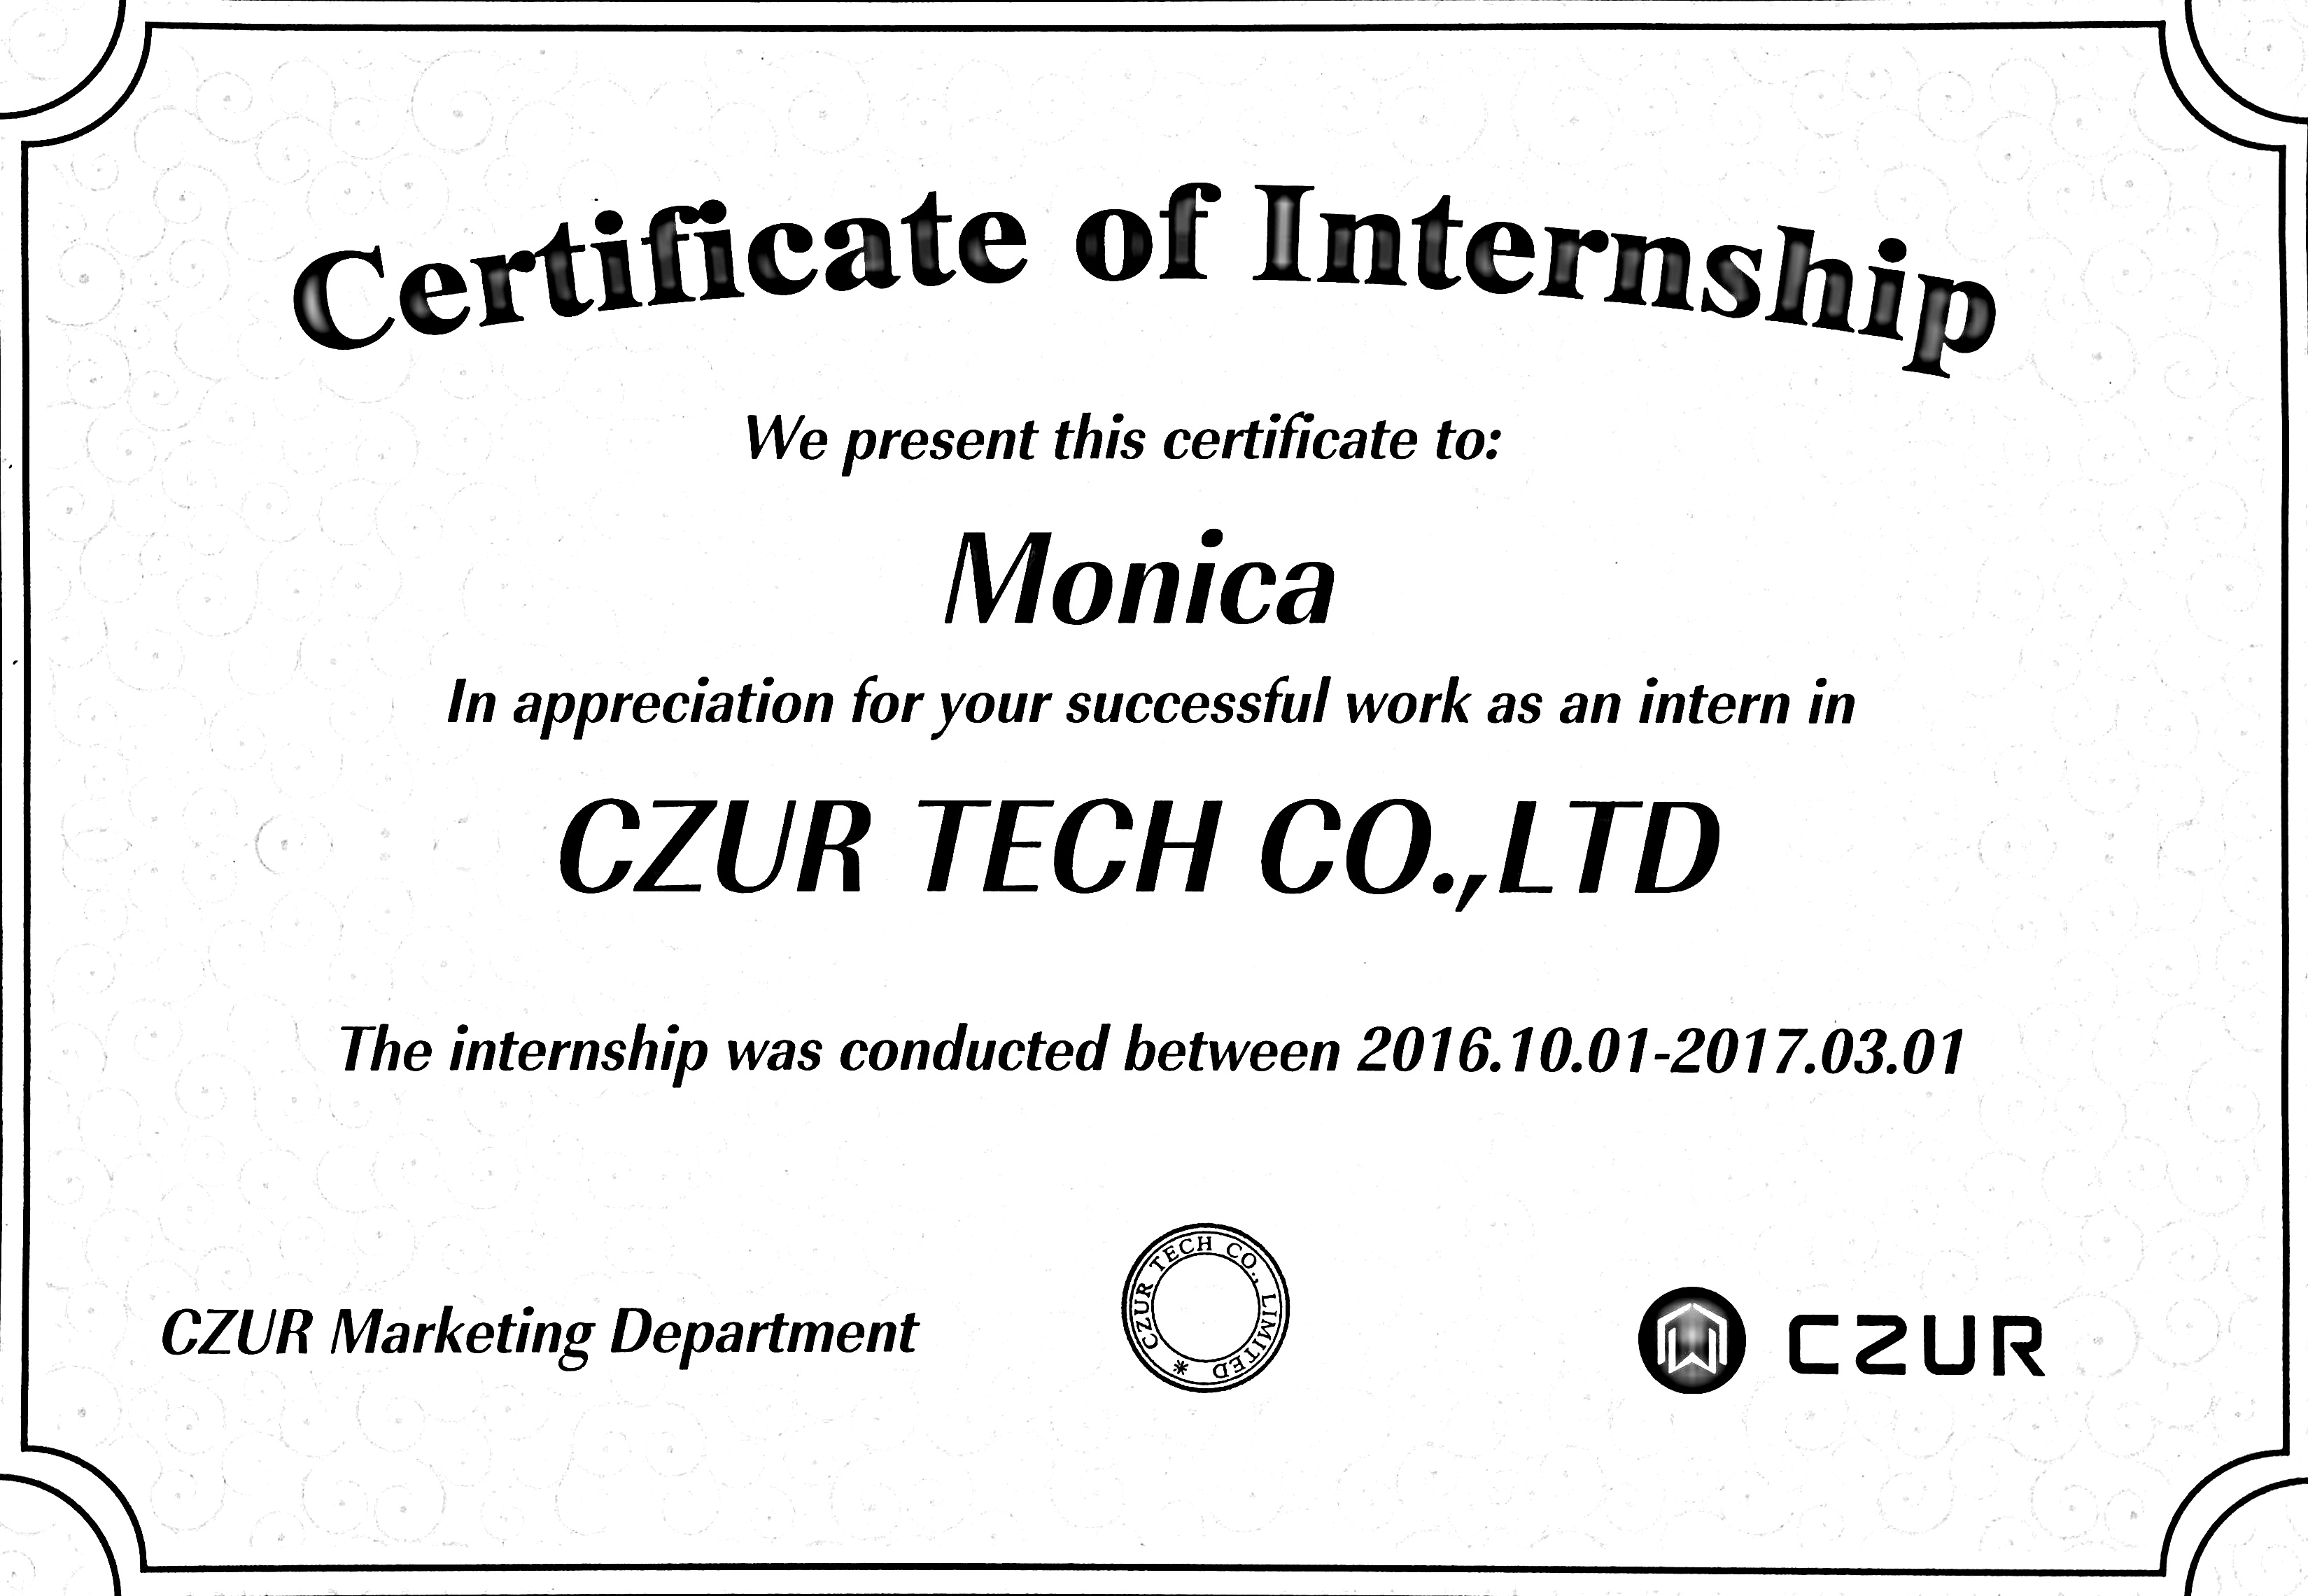 CZUR M3000 Pro Professional Book Scanner – Intelligent Software